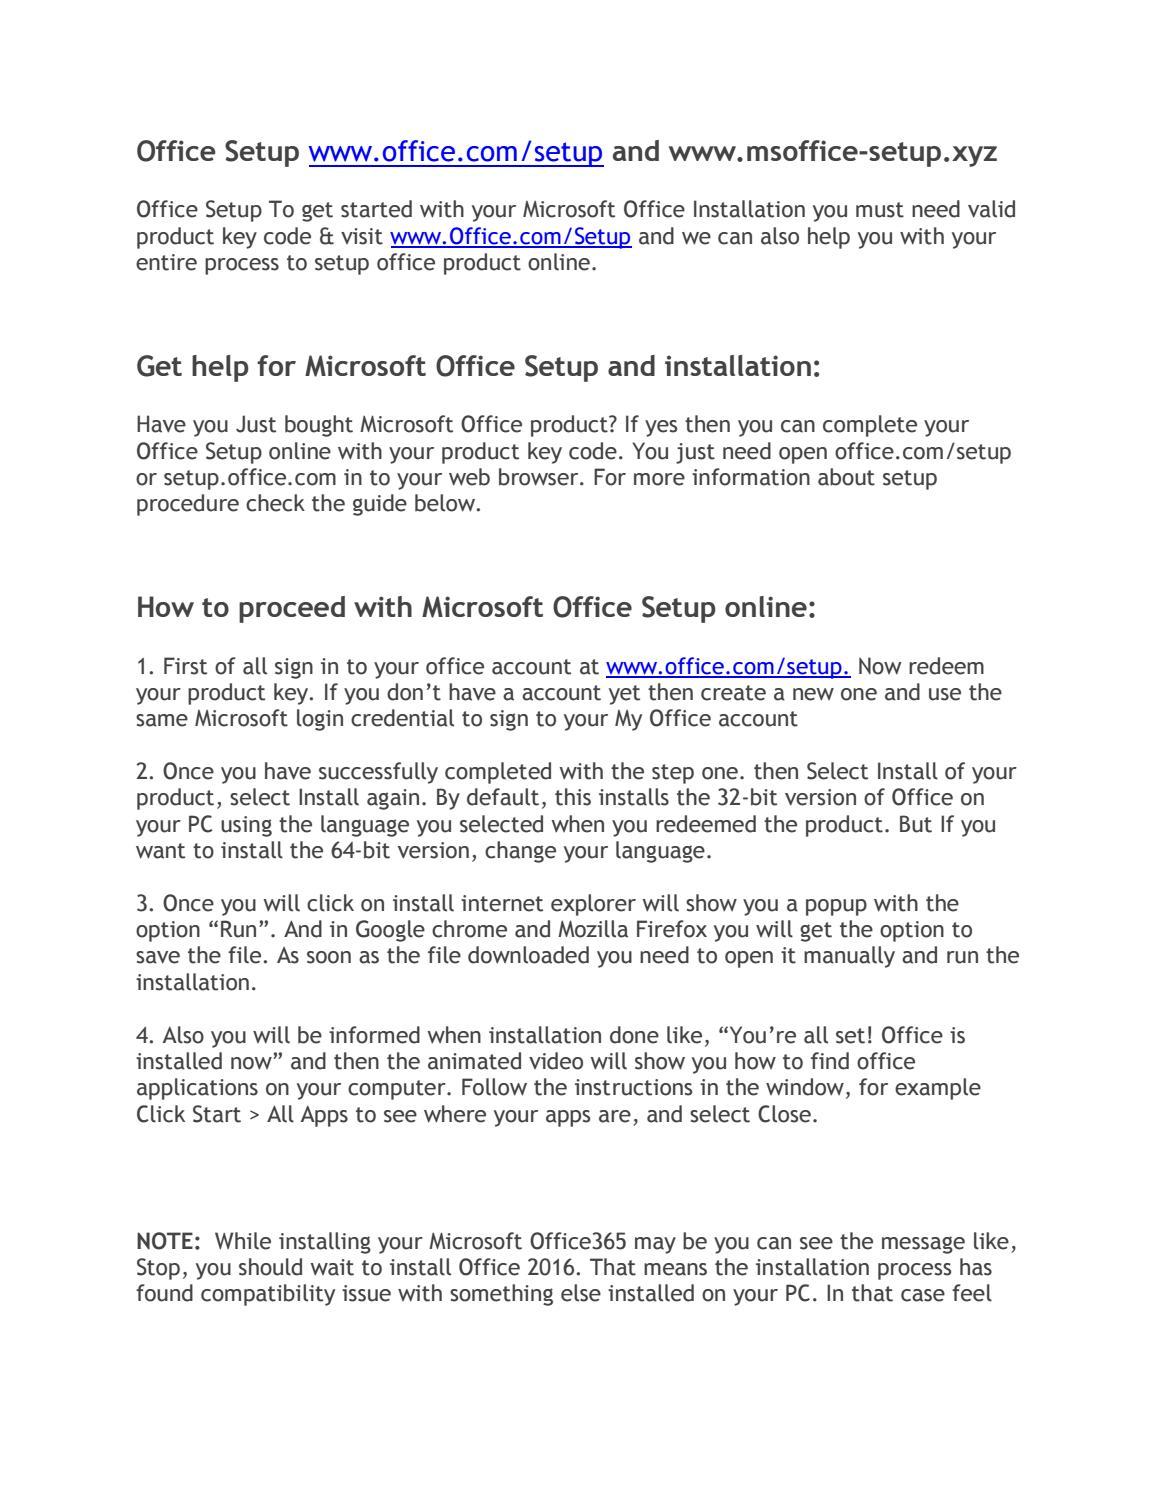 WWW OFFICE COM/SETUP | 1-855-441-4419 by msoffice-setup xyz